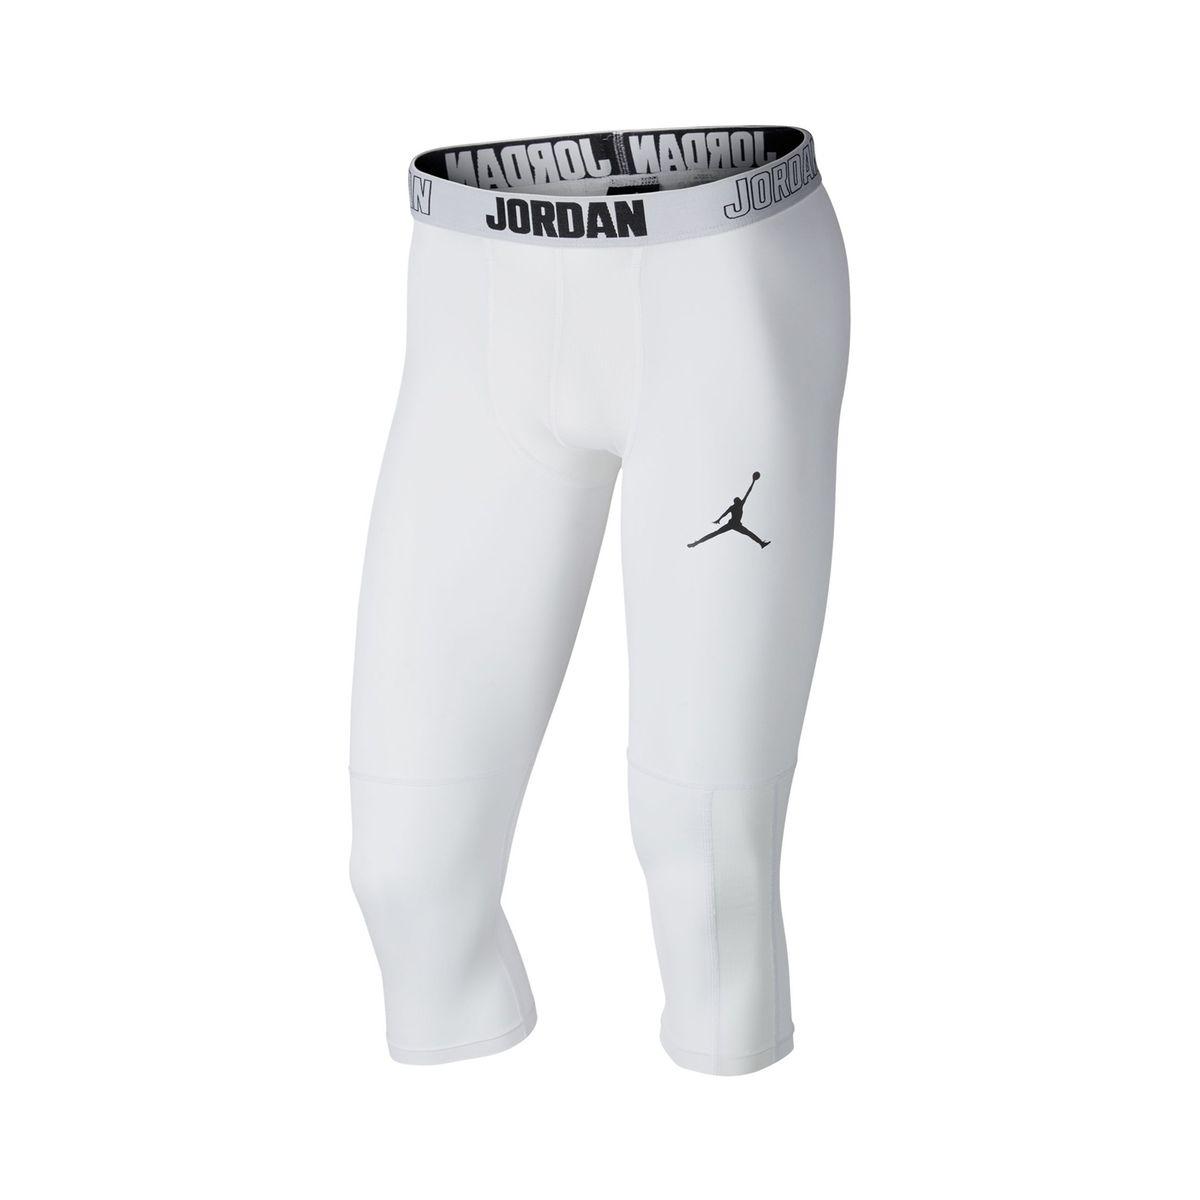 Collant 3/4 Nike Jordan 23 Alpha Blanc